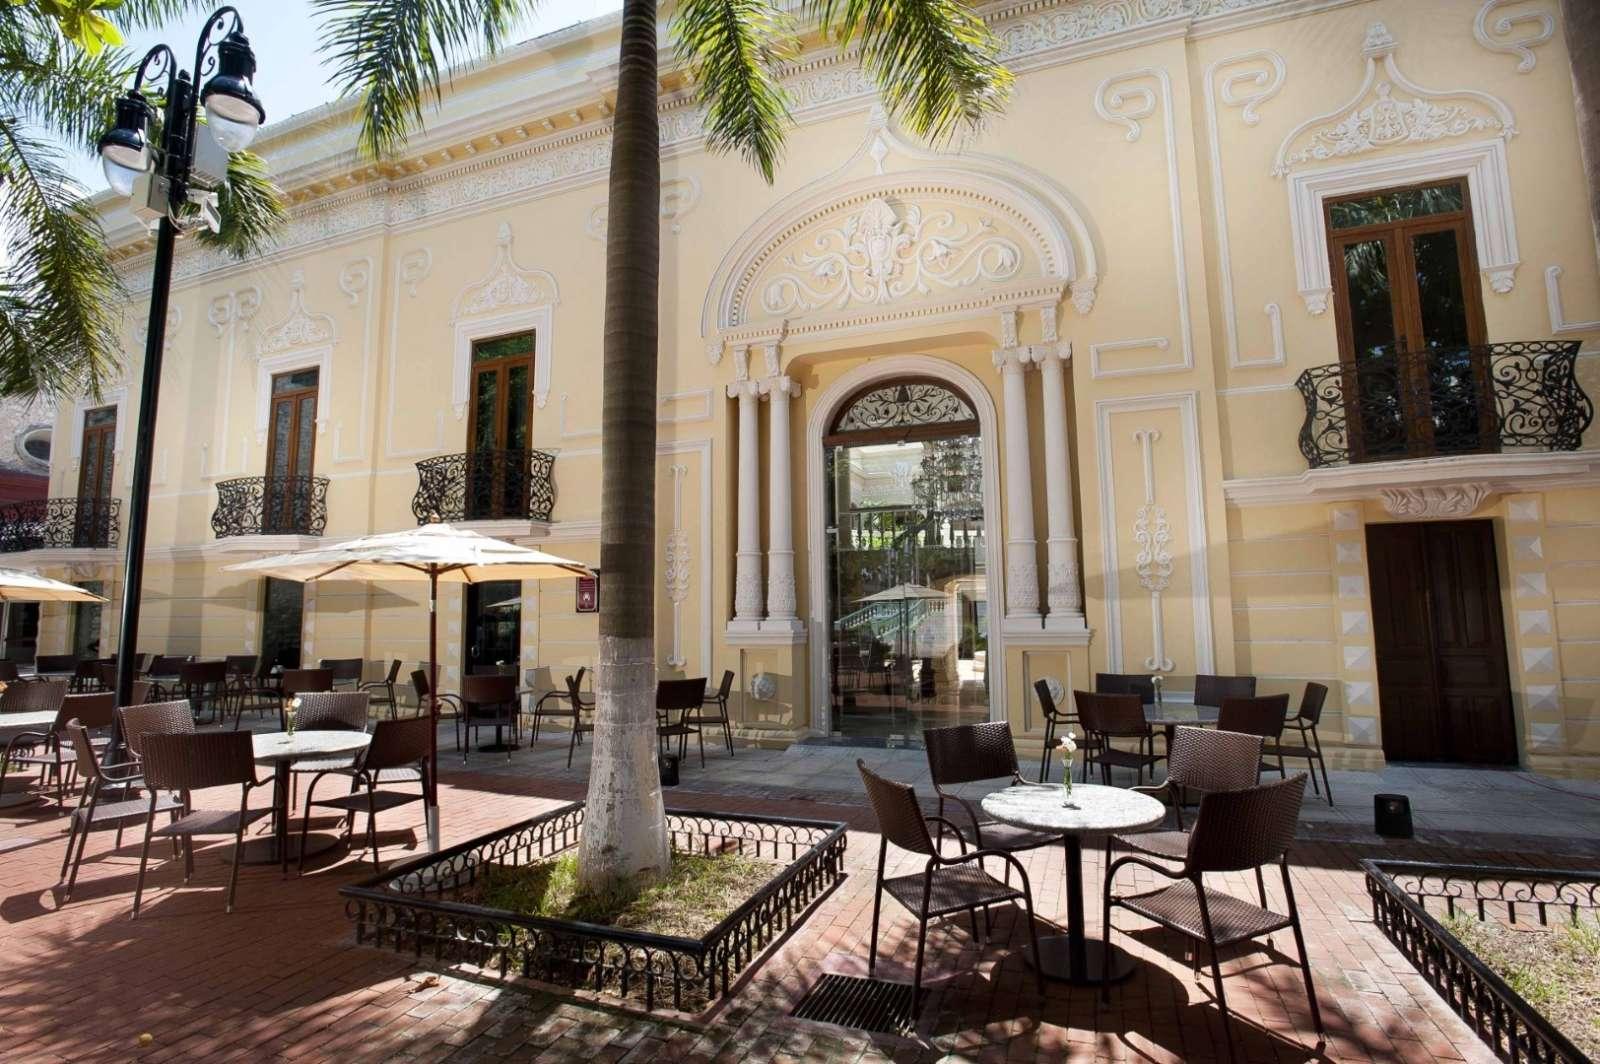 Park cafe at hotel Mansion Merida